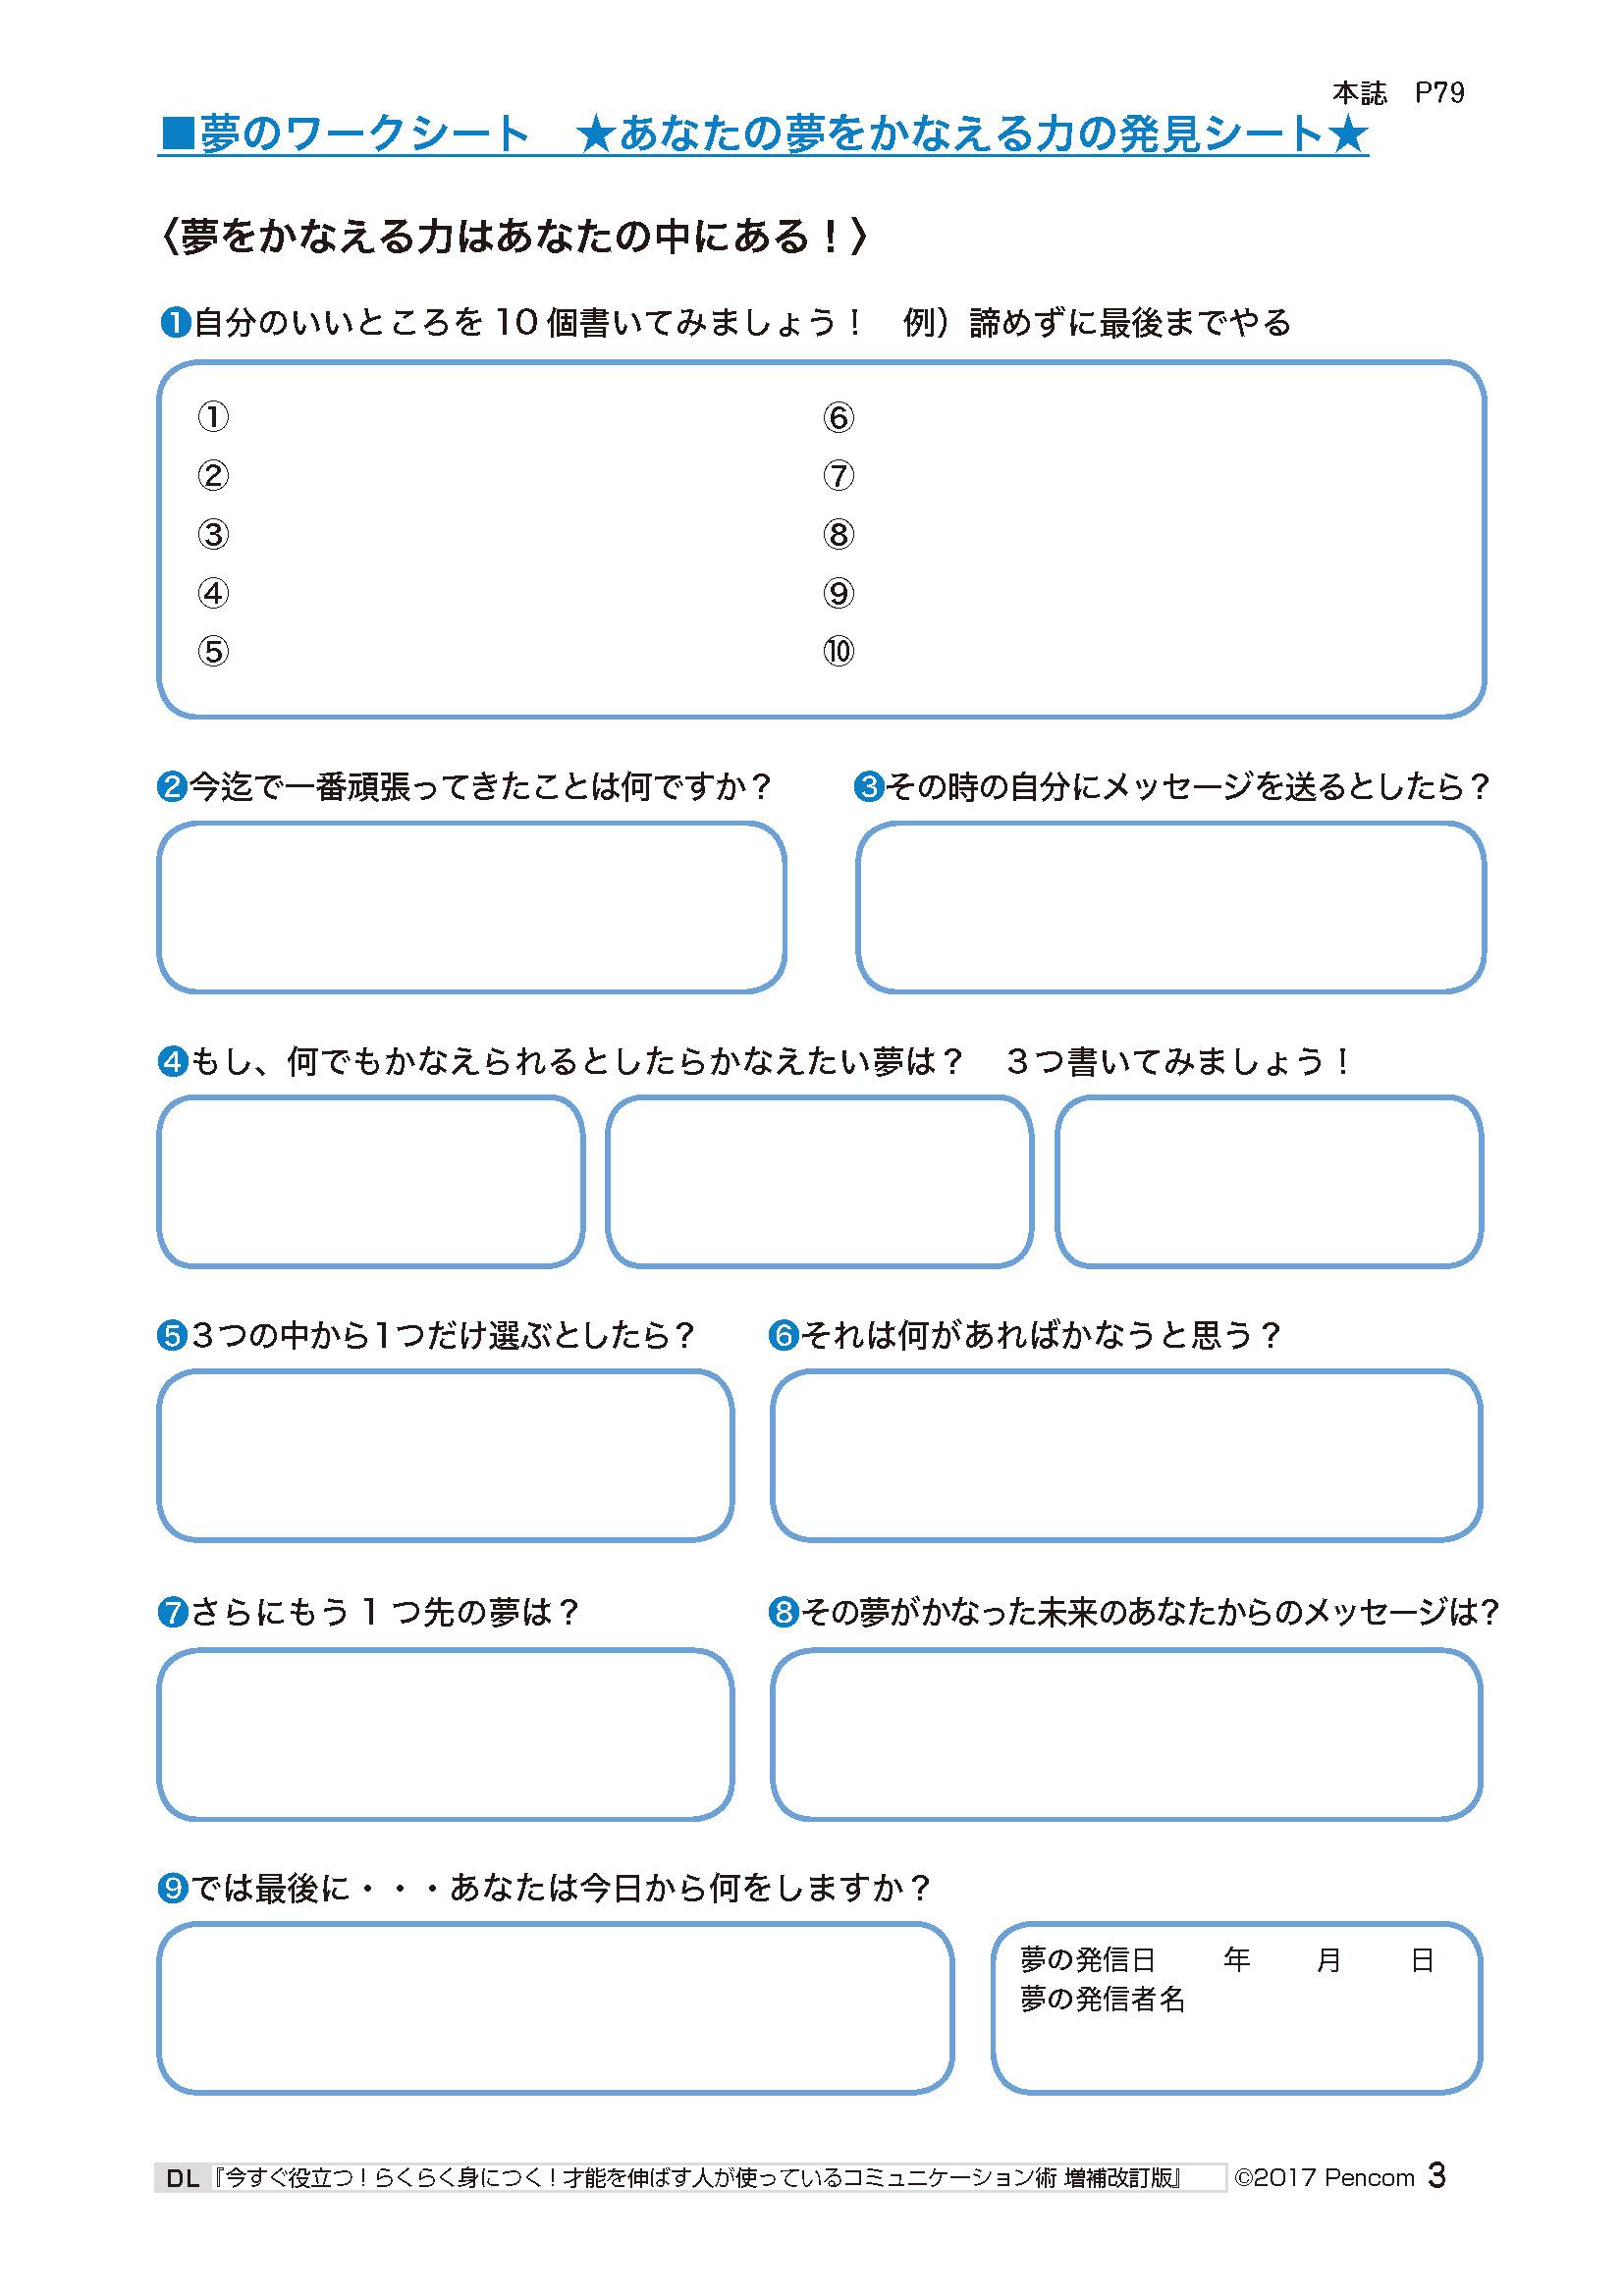 Communi File01 ページ 03